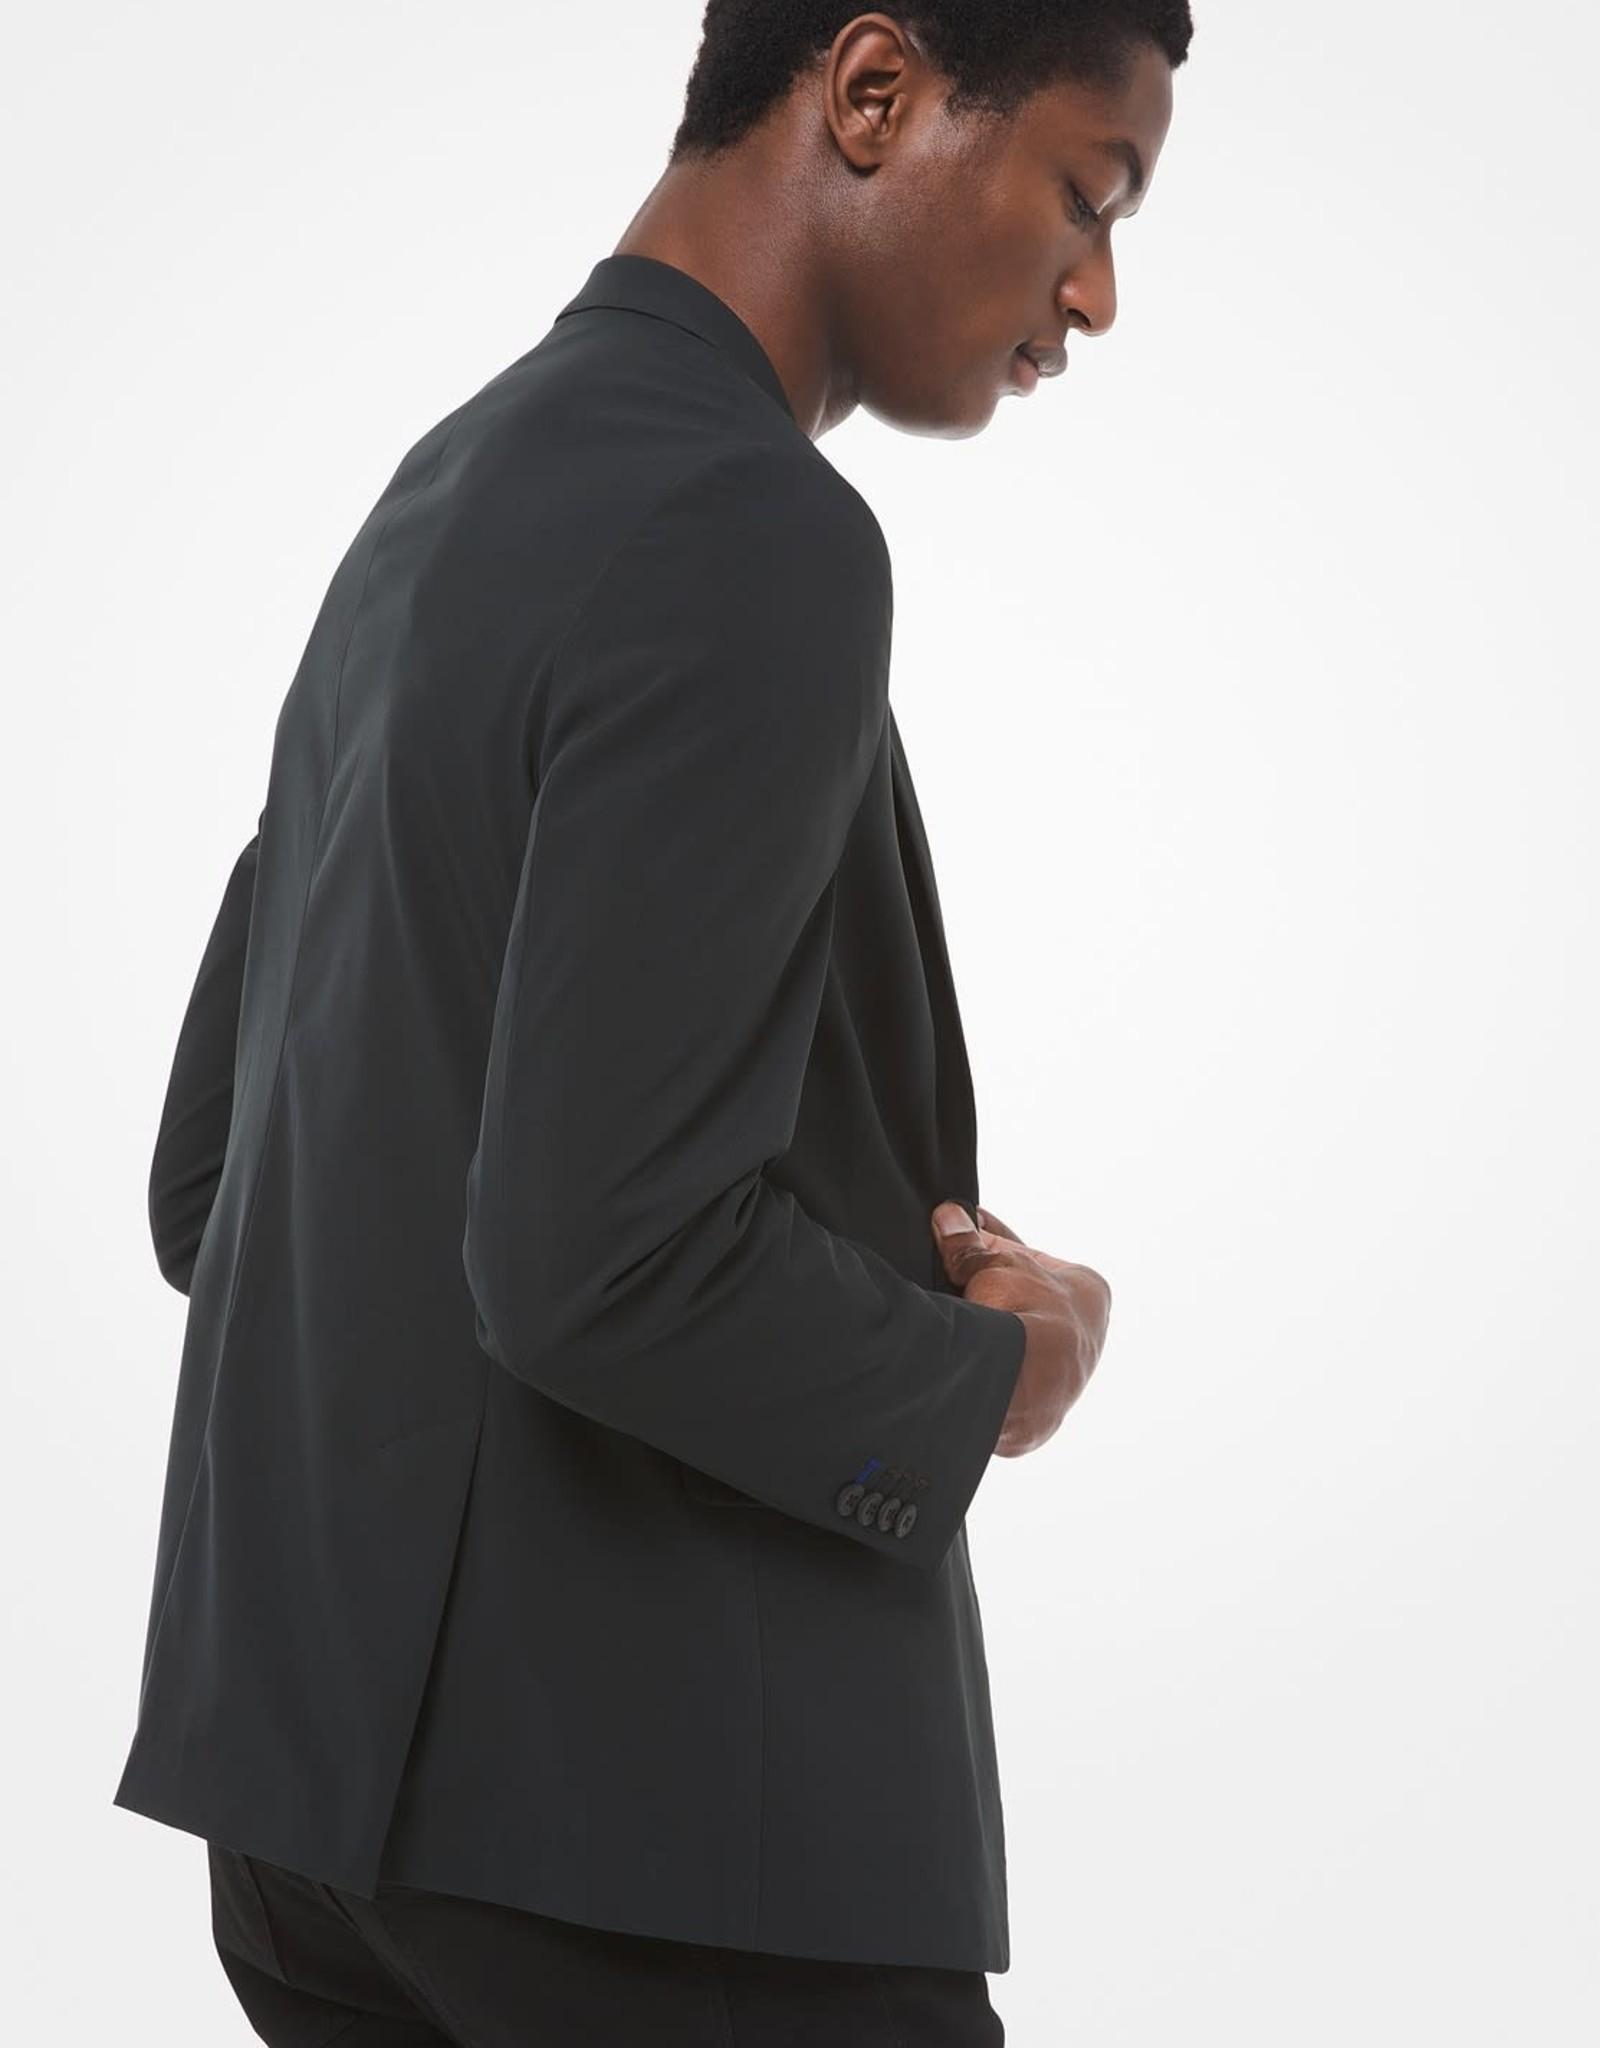 Michael Kors MK X Tech Blazer